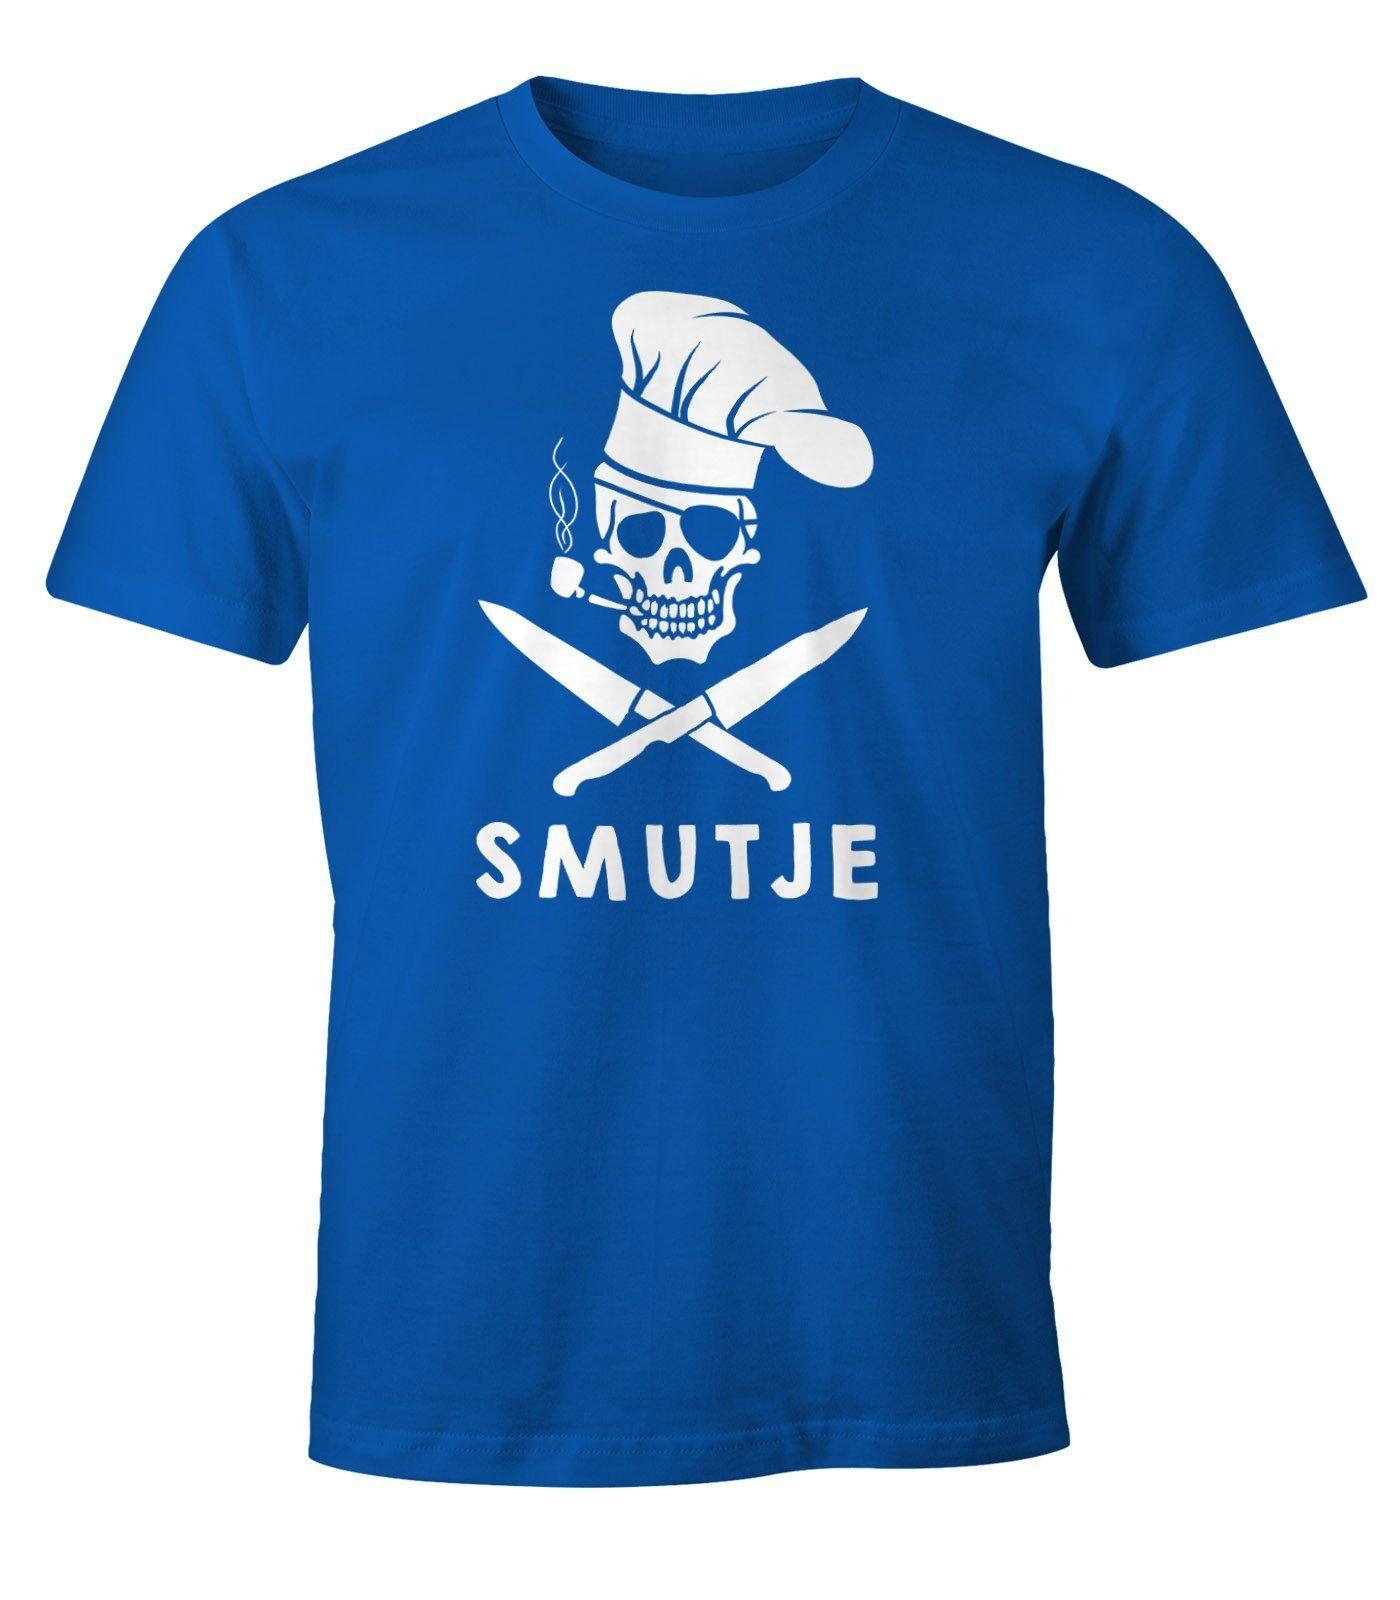 MoonWorks Print-Shirt »Herren T-Shirt Koch Smutje Pirat Fun-Shirt ®« mit Print, blau